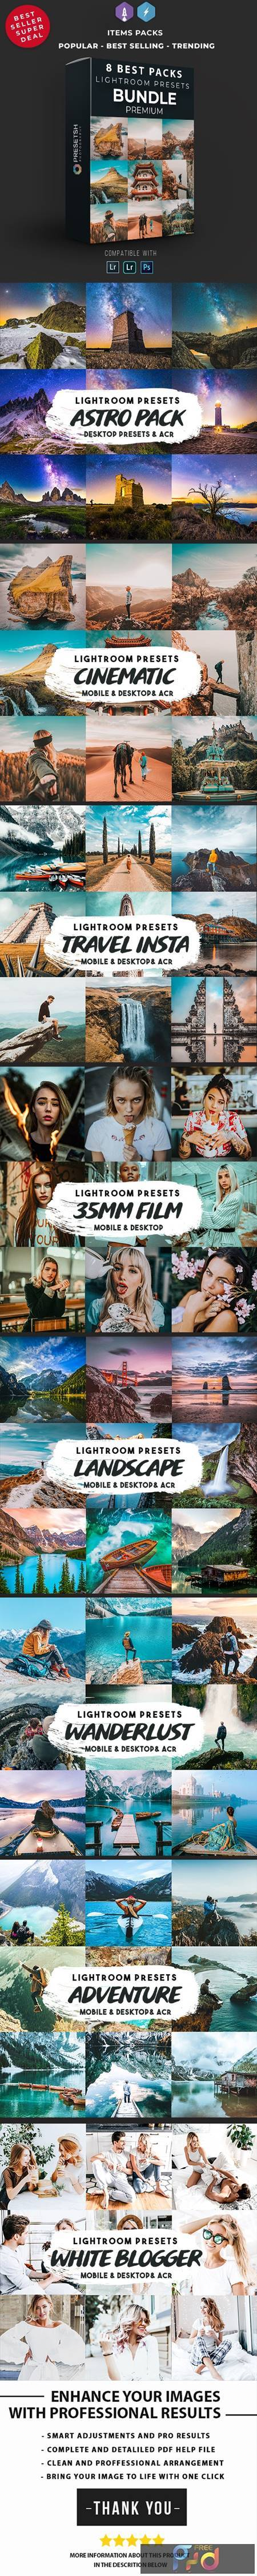 Lightroom Presets Bundle by presetsh 28211403 1